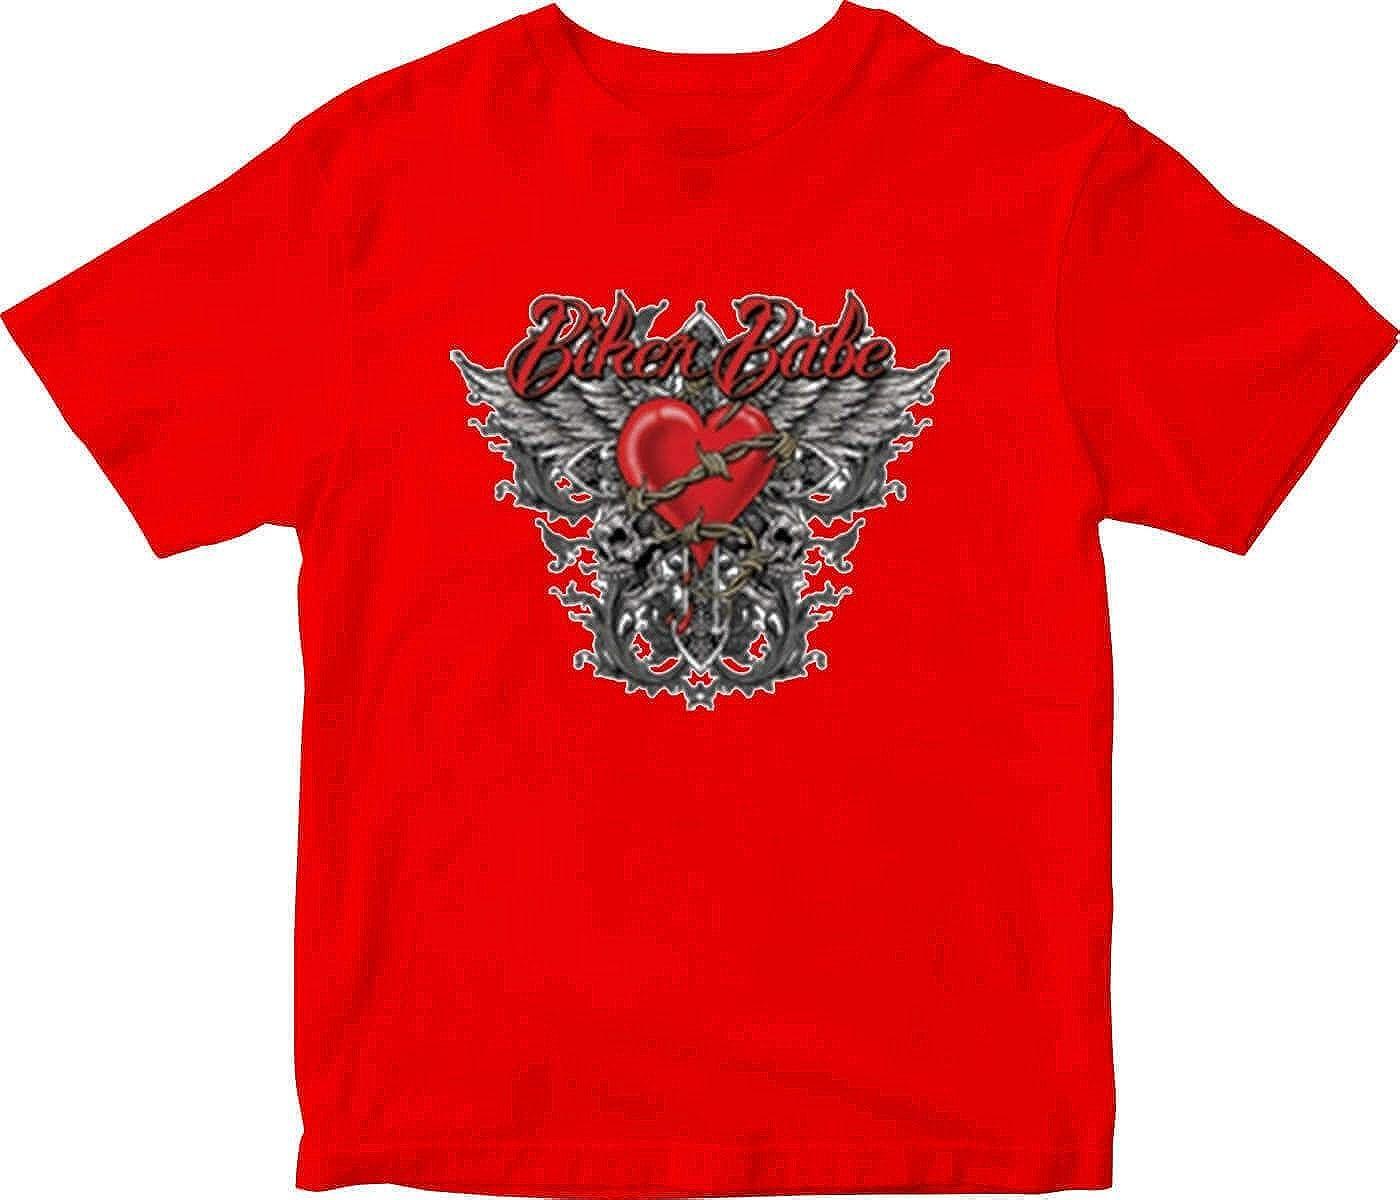 Biker Babe Adult Printed T-Shirt